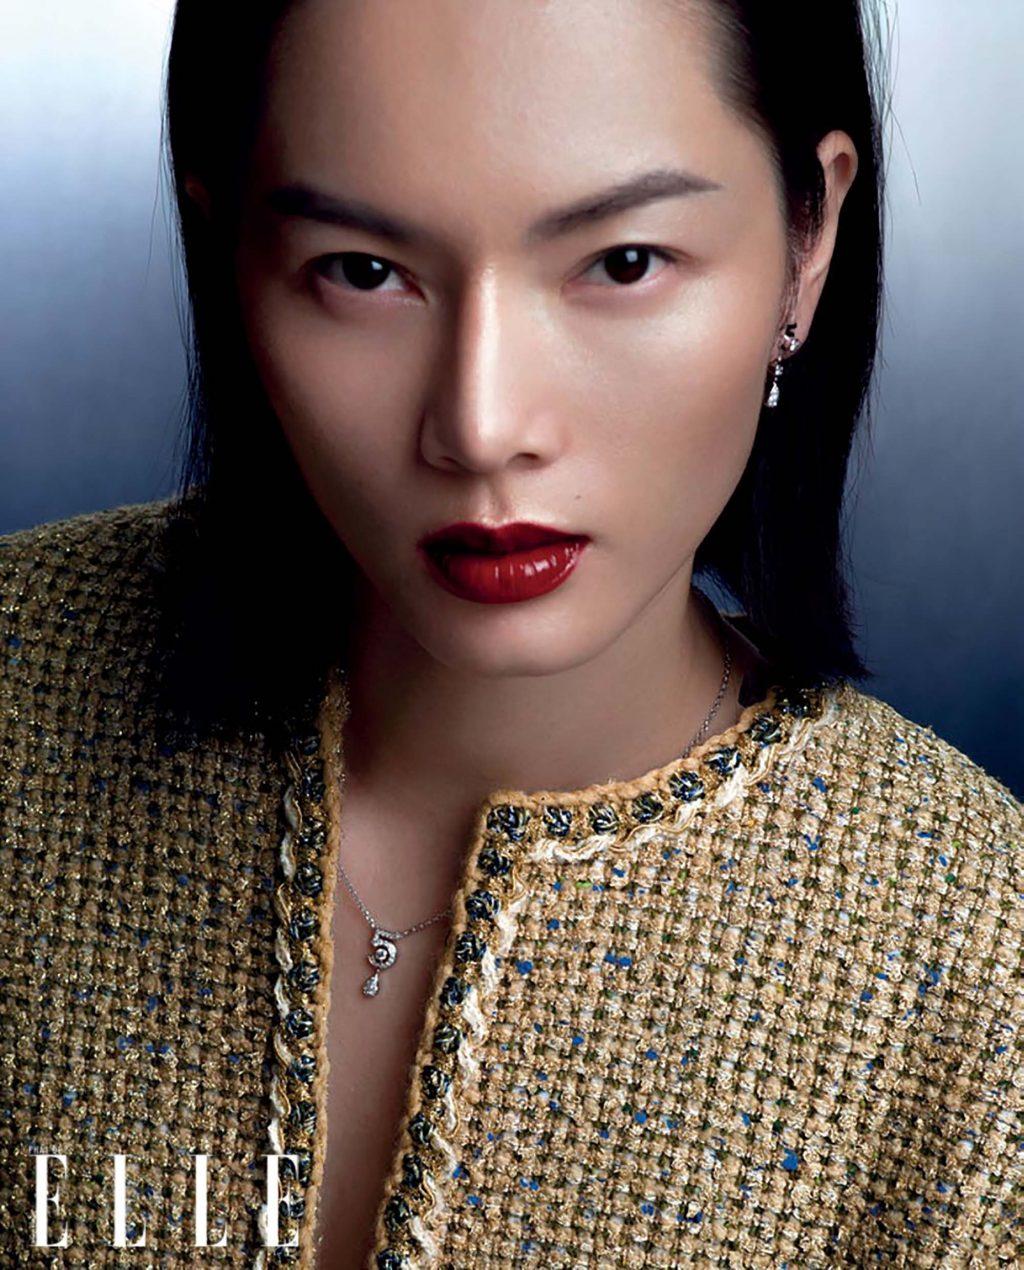 Bảo Hòa gương mặt trang bìa elle tháng 6